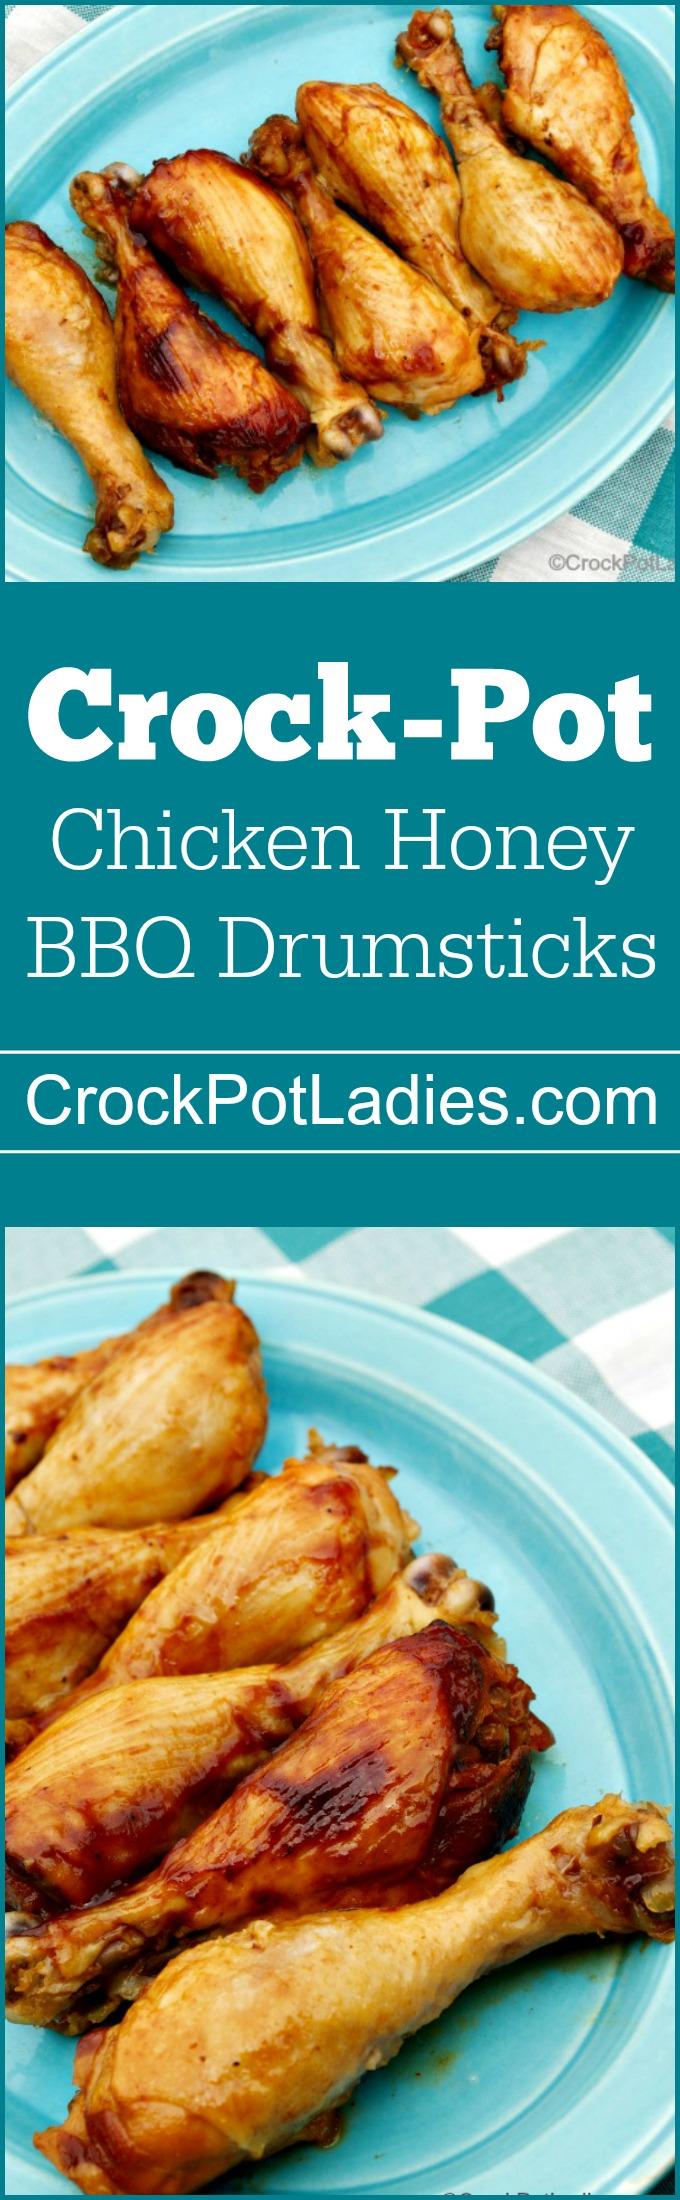 Crock-Pot Chicken Honey BBQ Drumsticks - With just three ingredients (chicken legs, barbecue sauce and honey) this recipe for Crock-Pot Chicken Honey BBQ Drumsticks is sure to please everyone! | via CrockPotLadies.com